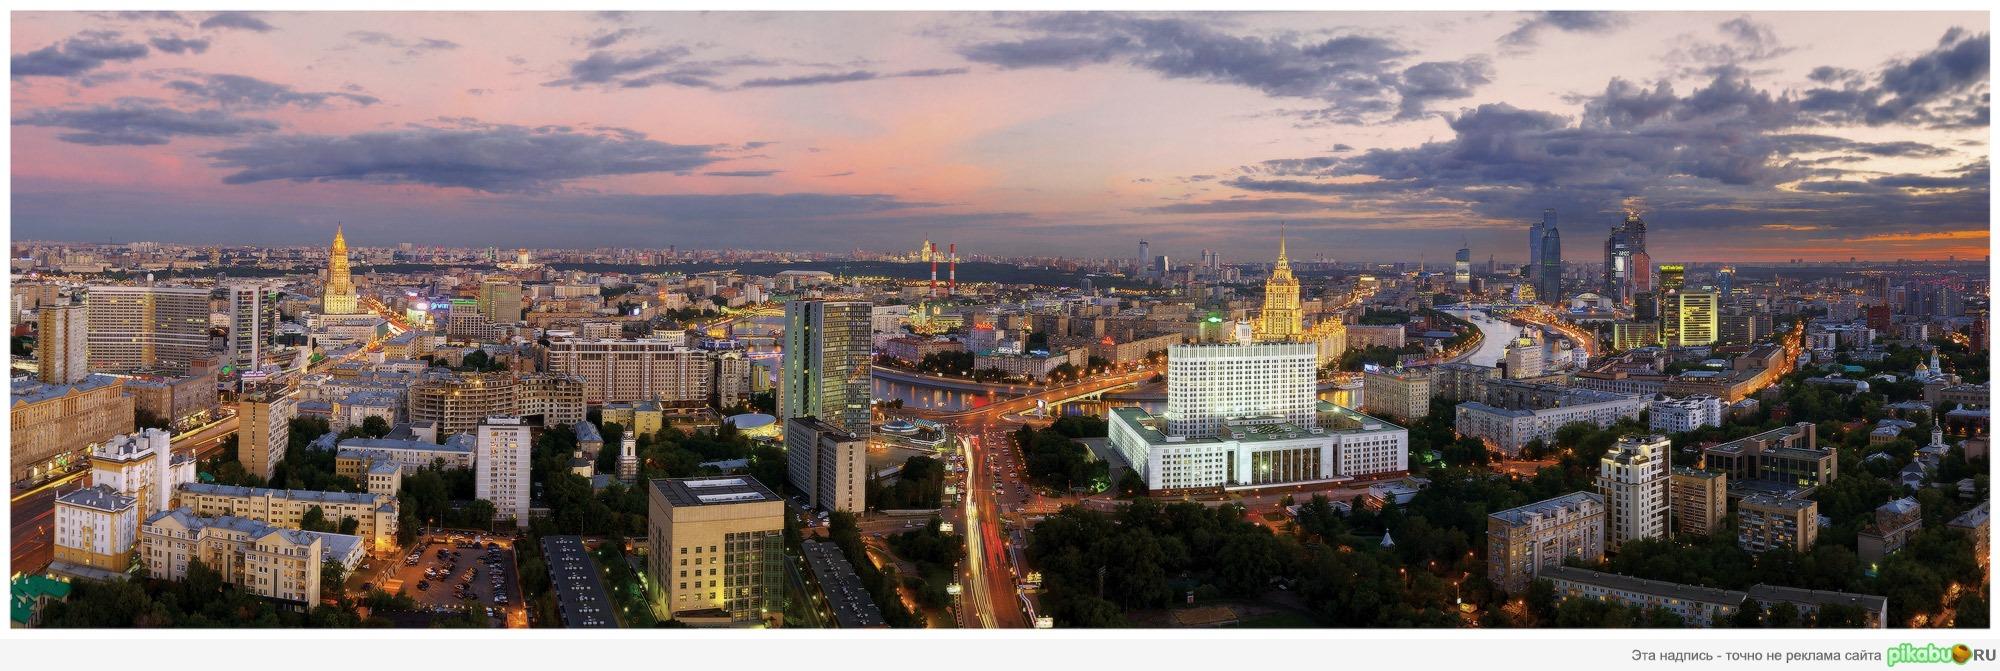 Дешевая Москва